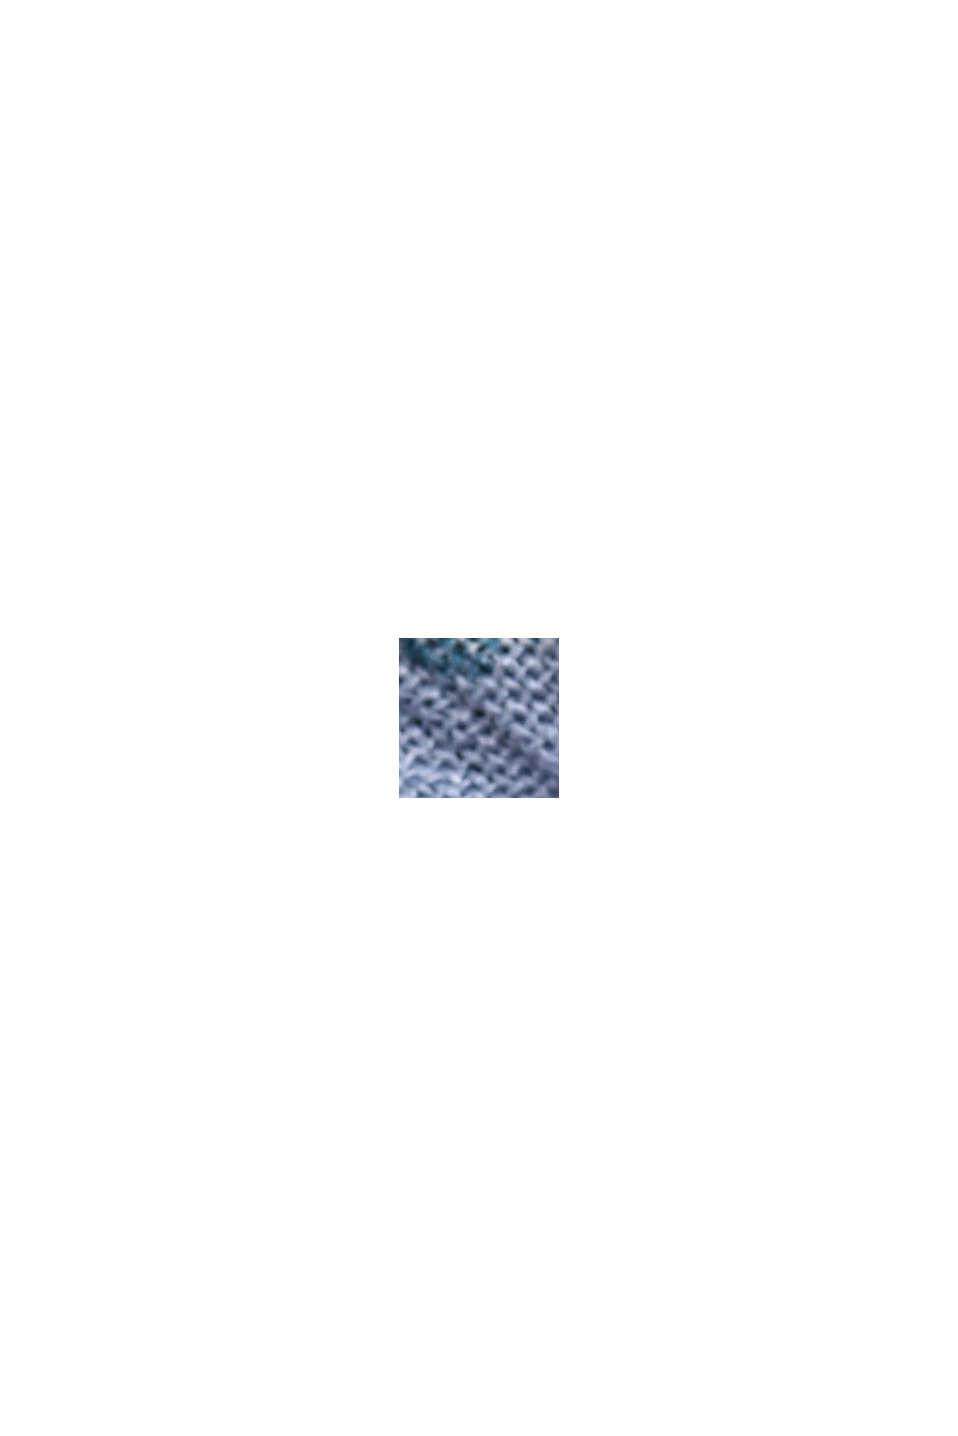 Blousejurk met gesmokte details, LENZING™ ECOVERO™, LIGHT BLUE LAVENDER, swatch